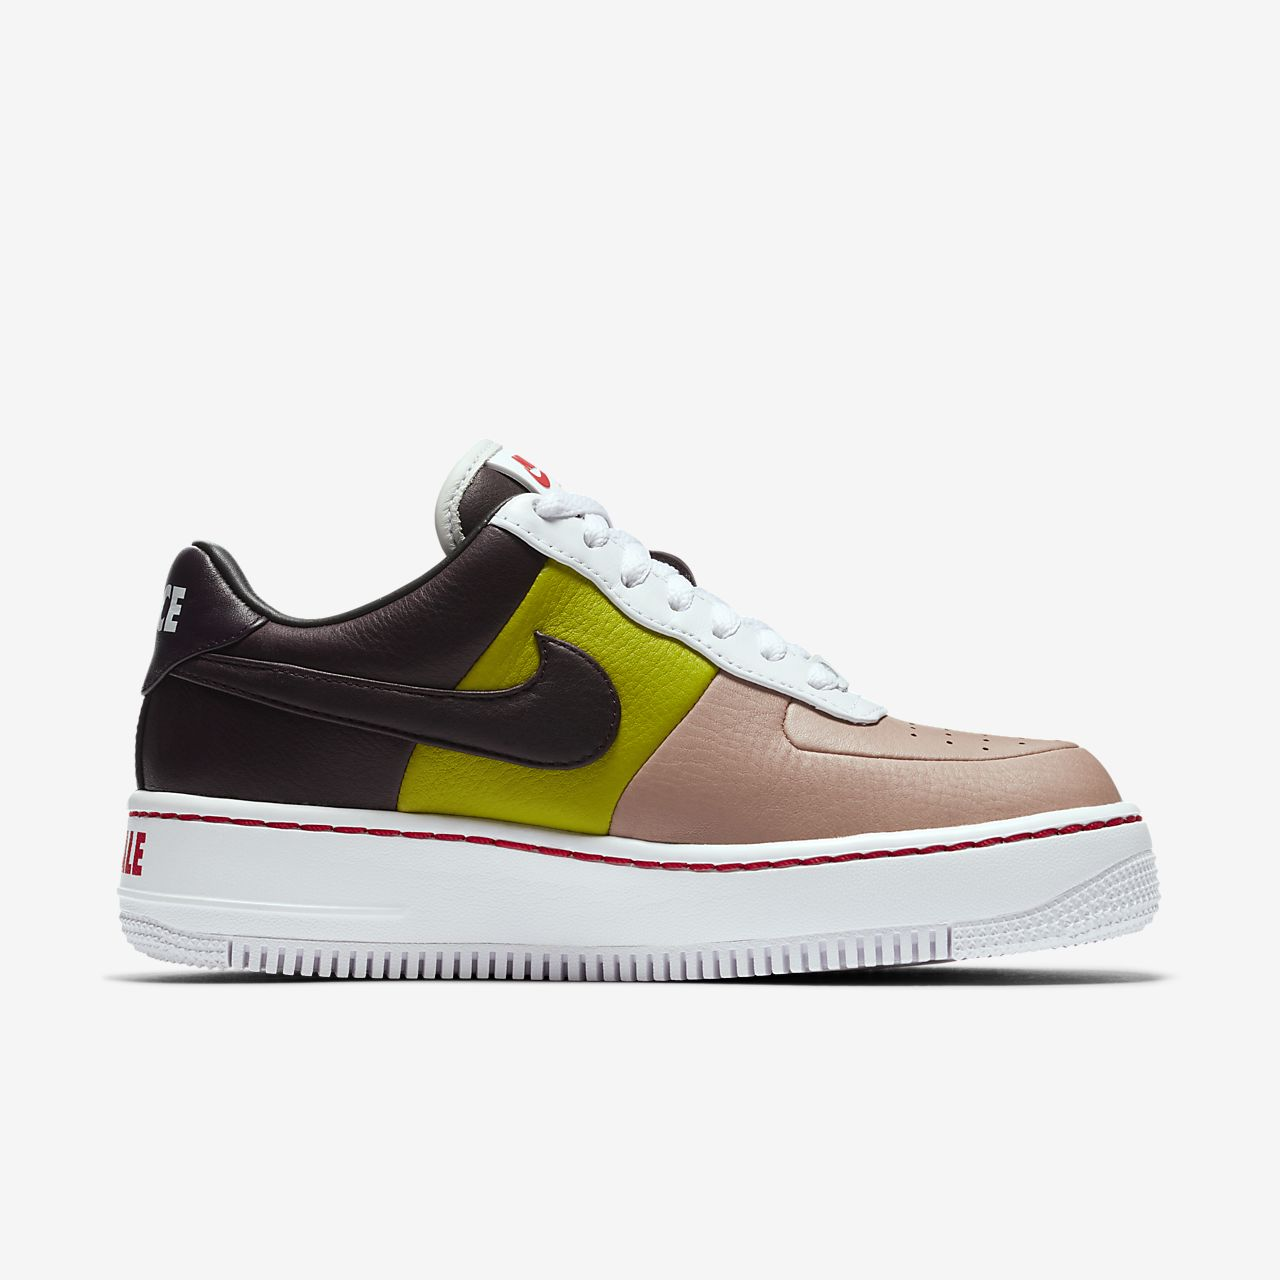 Nike Women's Women's Air Force 1 Upstep Lx Shoe iP1XBqcH